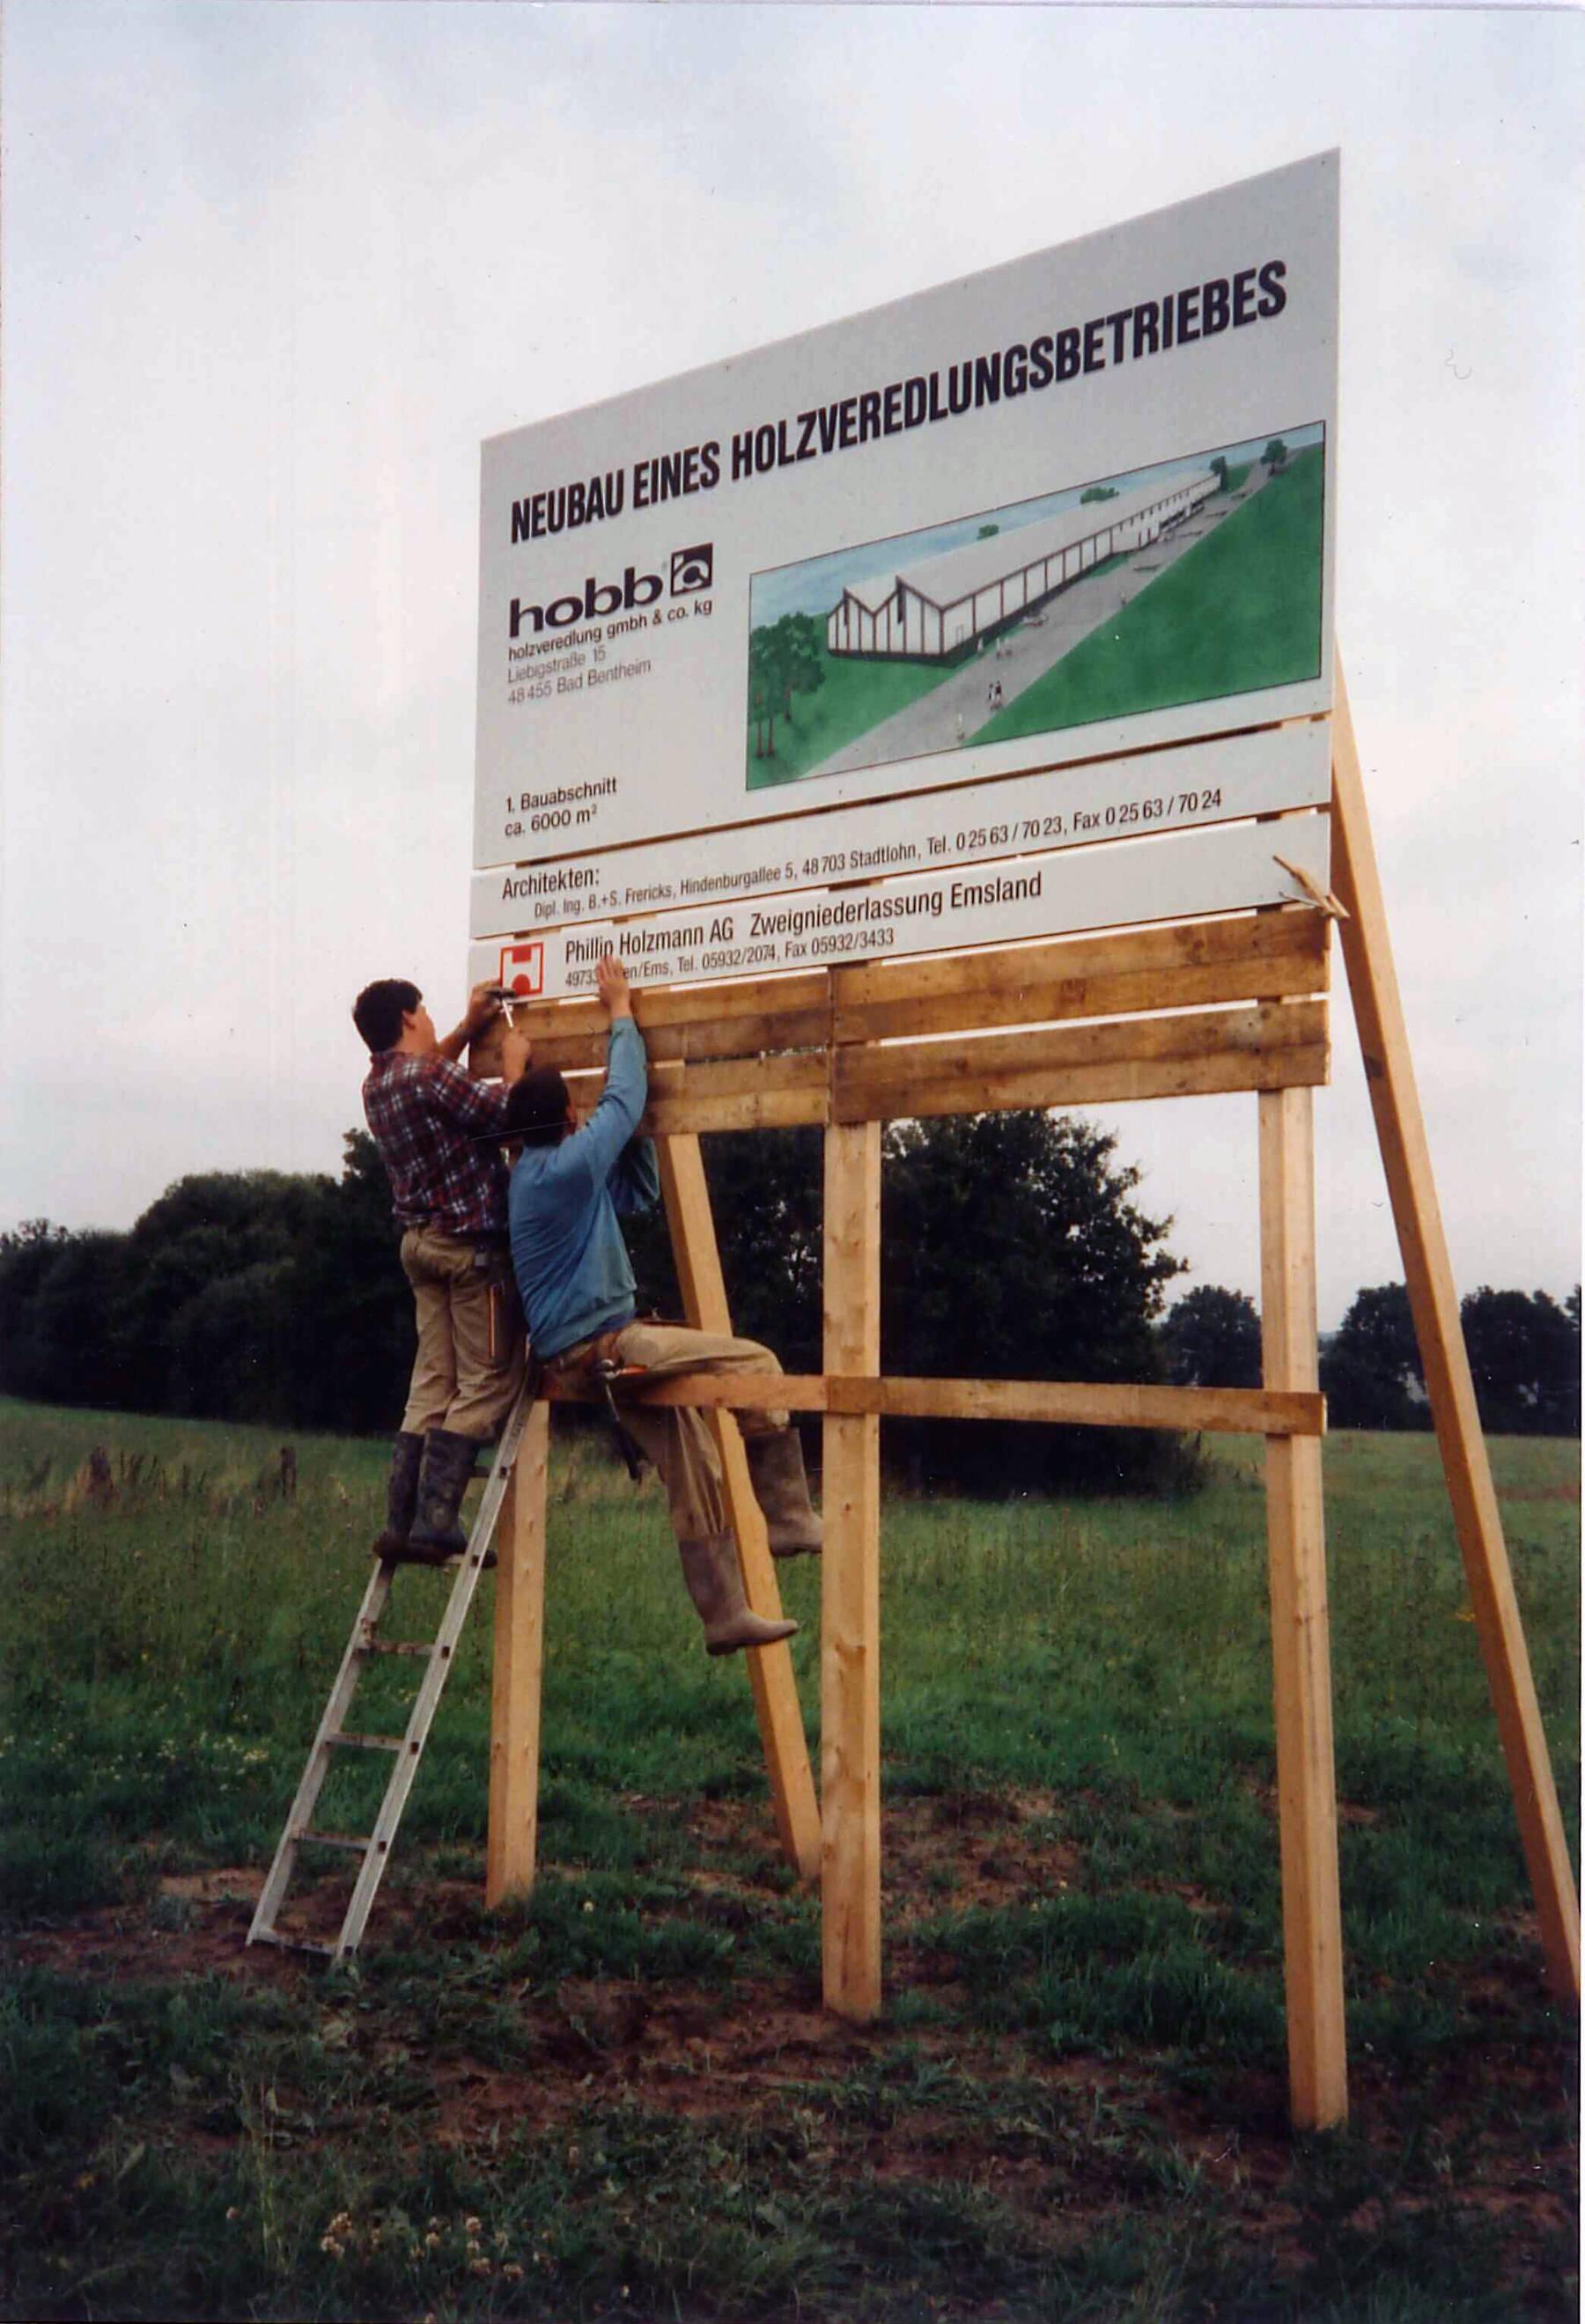 Architekt Stadtlohn history hobb de